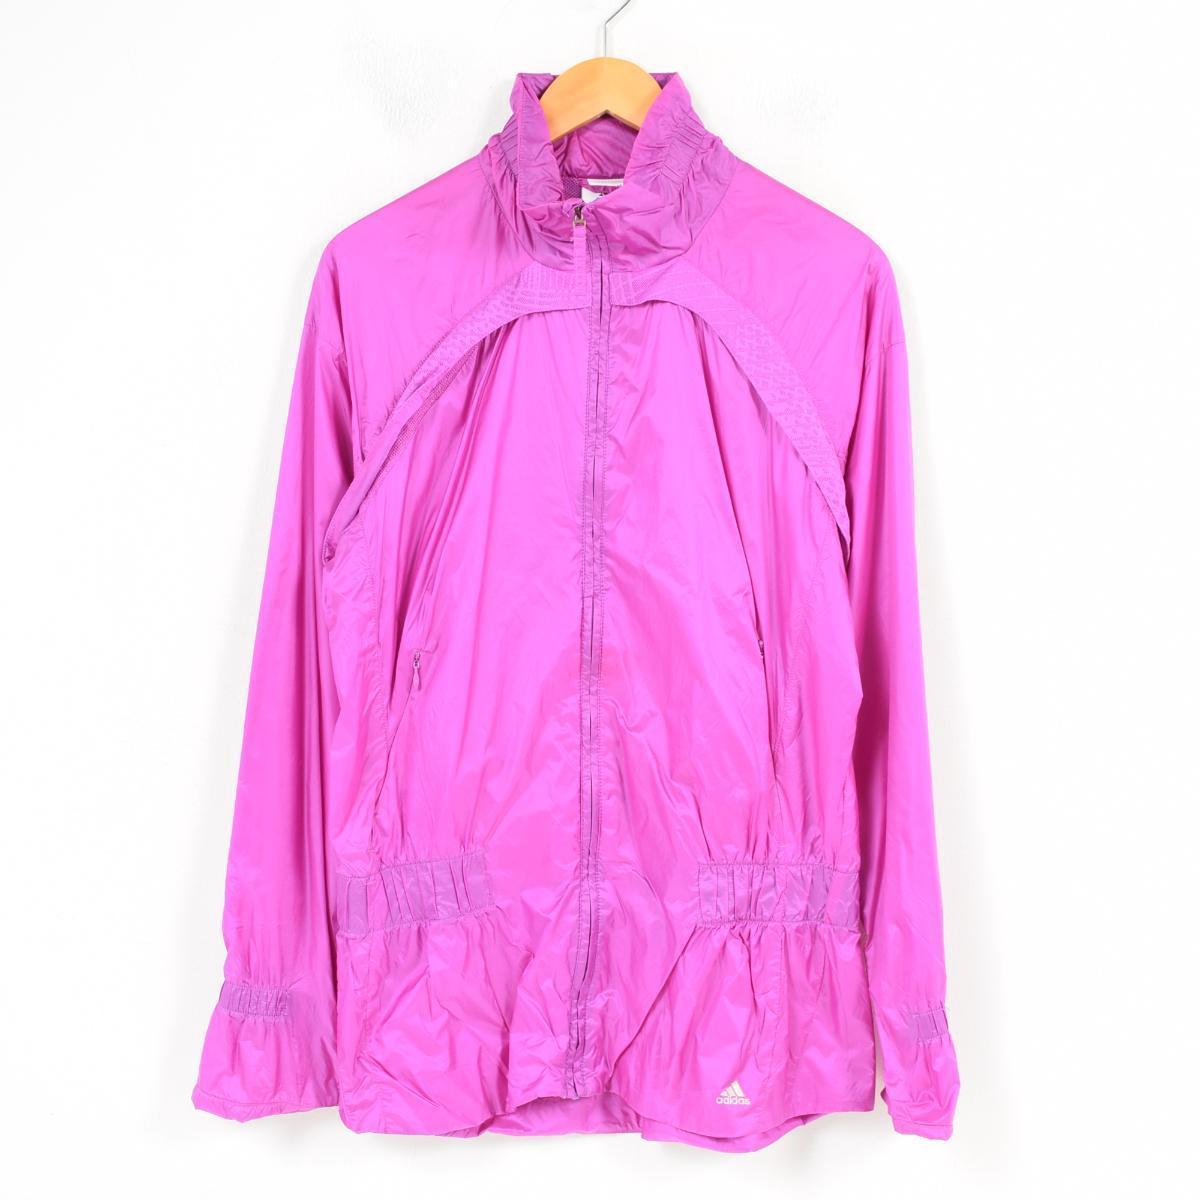 3a37a8654 Adidas adidas adizero nylon jacket Lady's L /wap0422